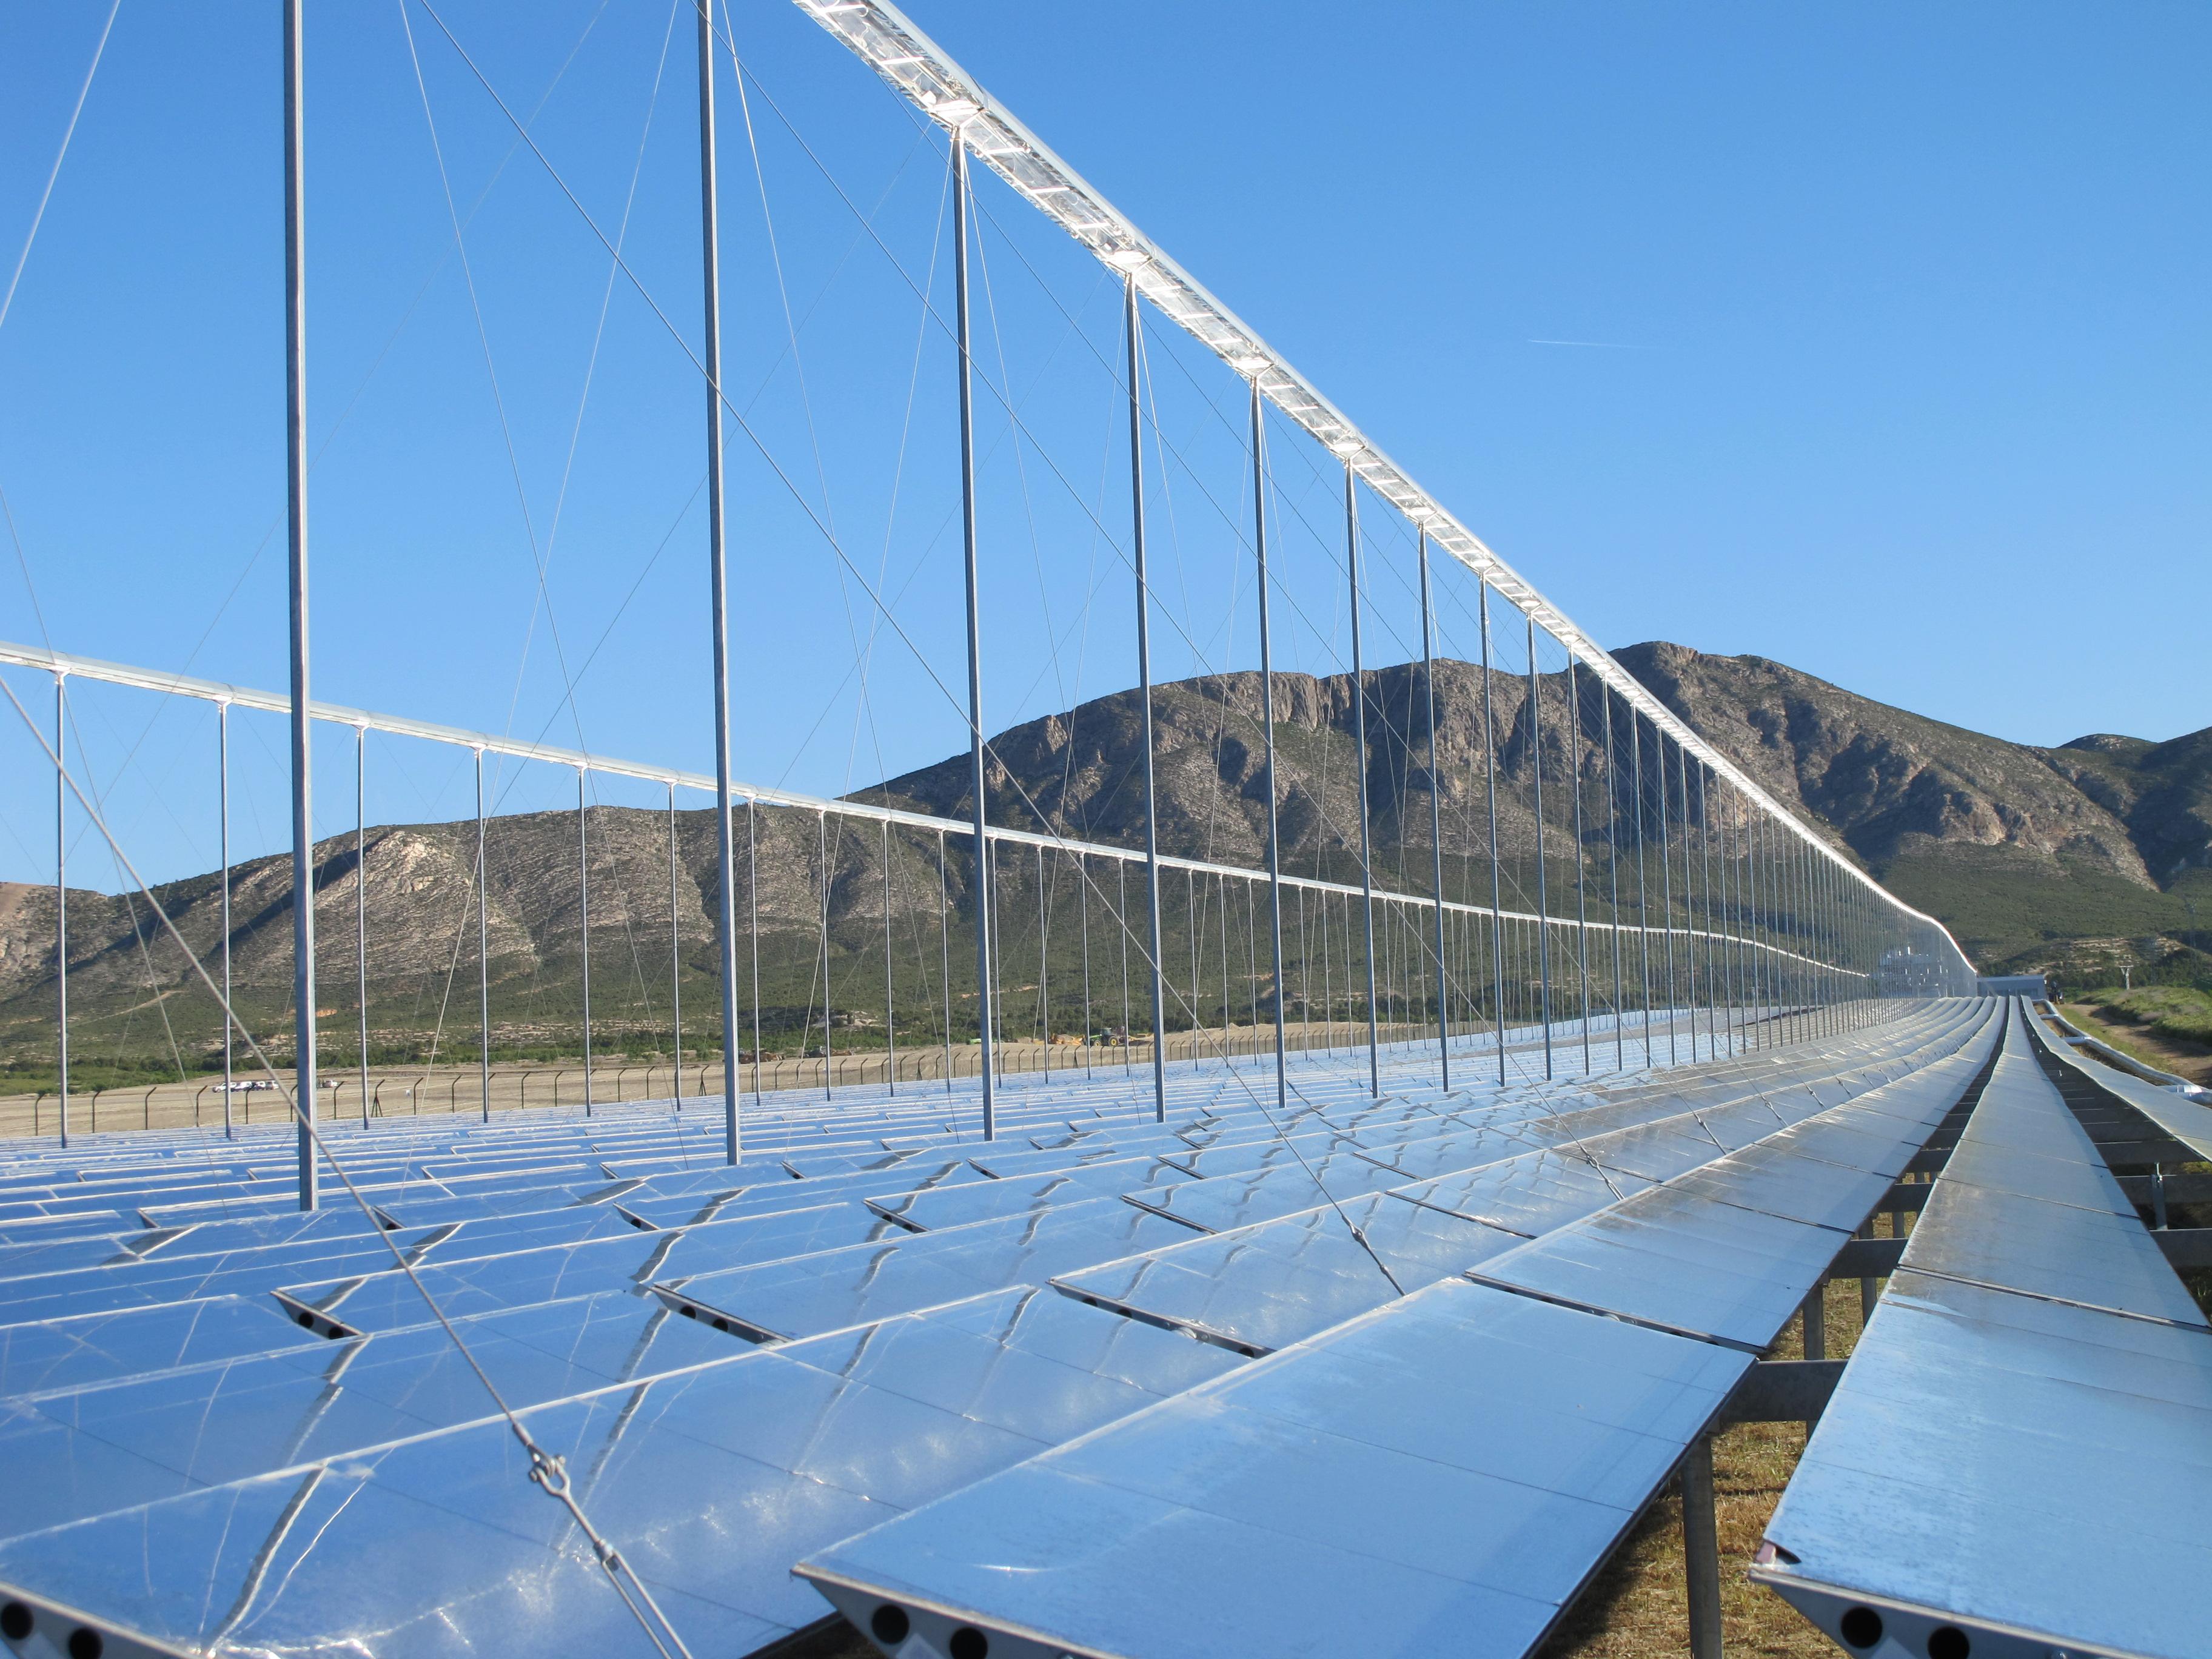 La central termosolar en Calasparra (provincia de Murcia) producirá 30 megavatios